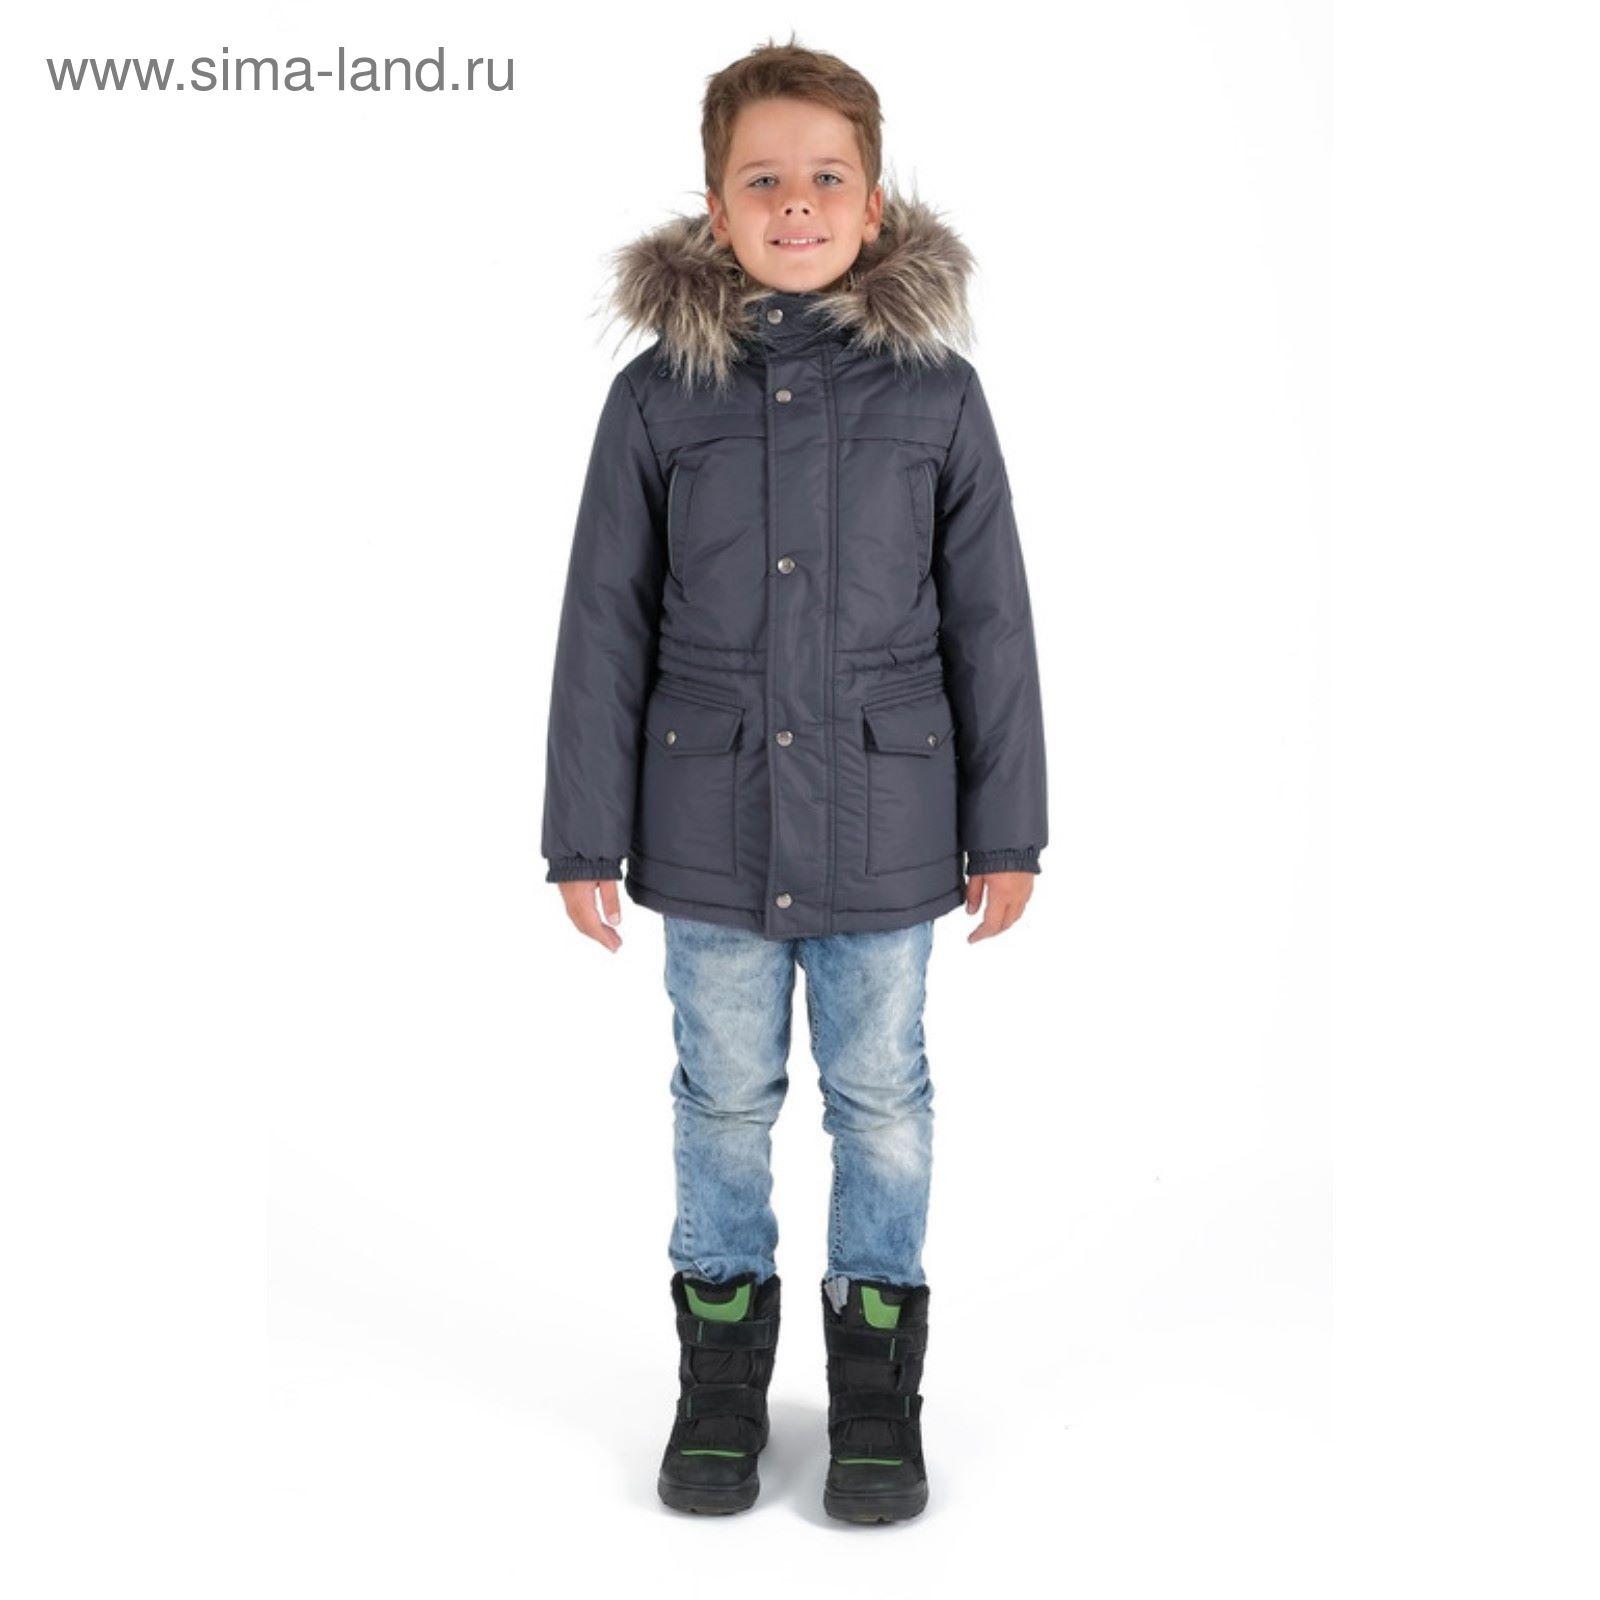 33abfd27b28 Куртка (парка) зимняя для мальчика Воды Фанди